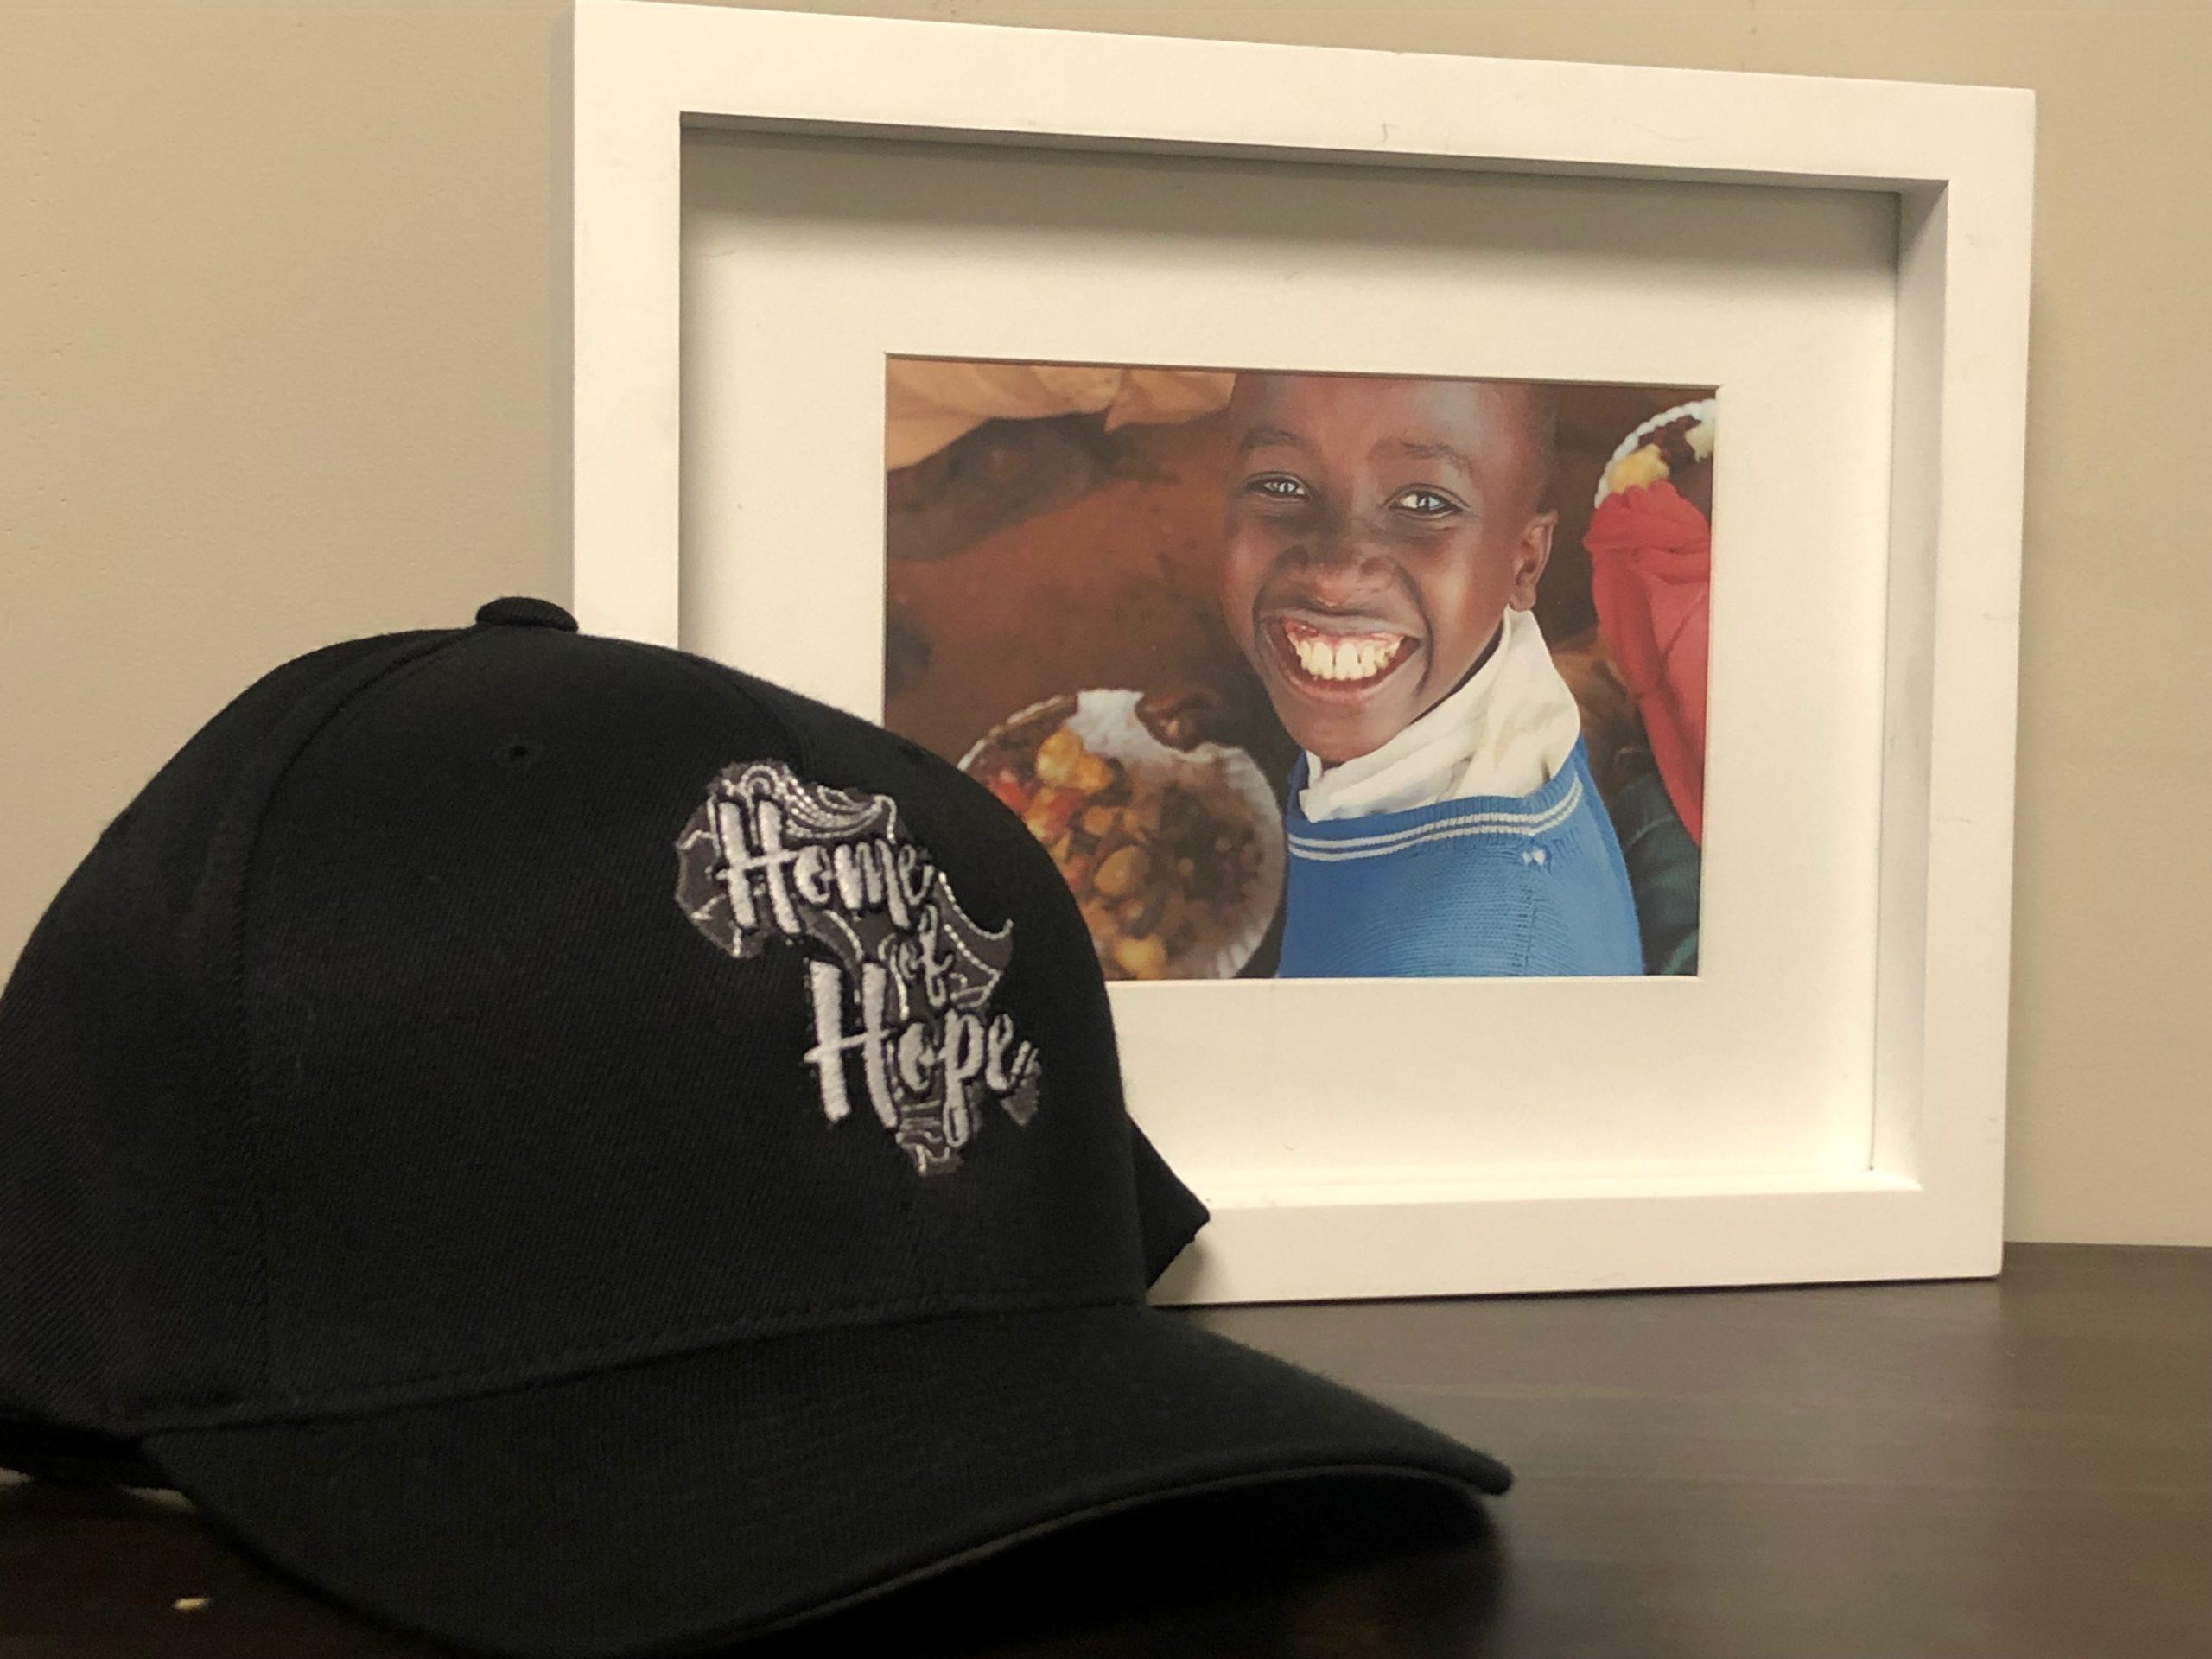 homeofhope home of hope hat black logo merch product merchandise donate donation sponsor sponsorship help donations child health cards healthcard feeding program